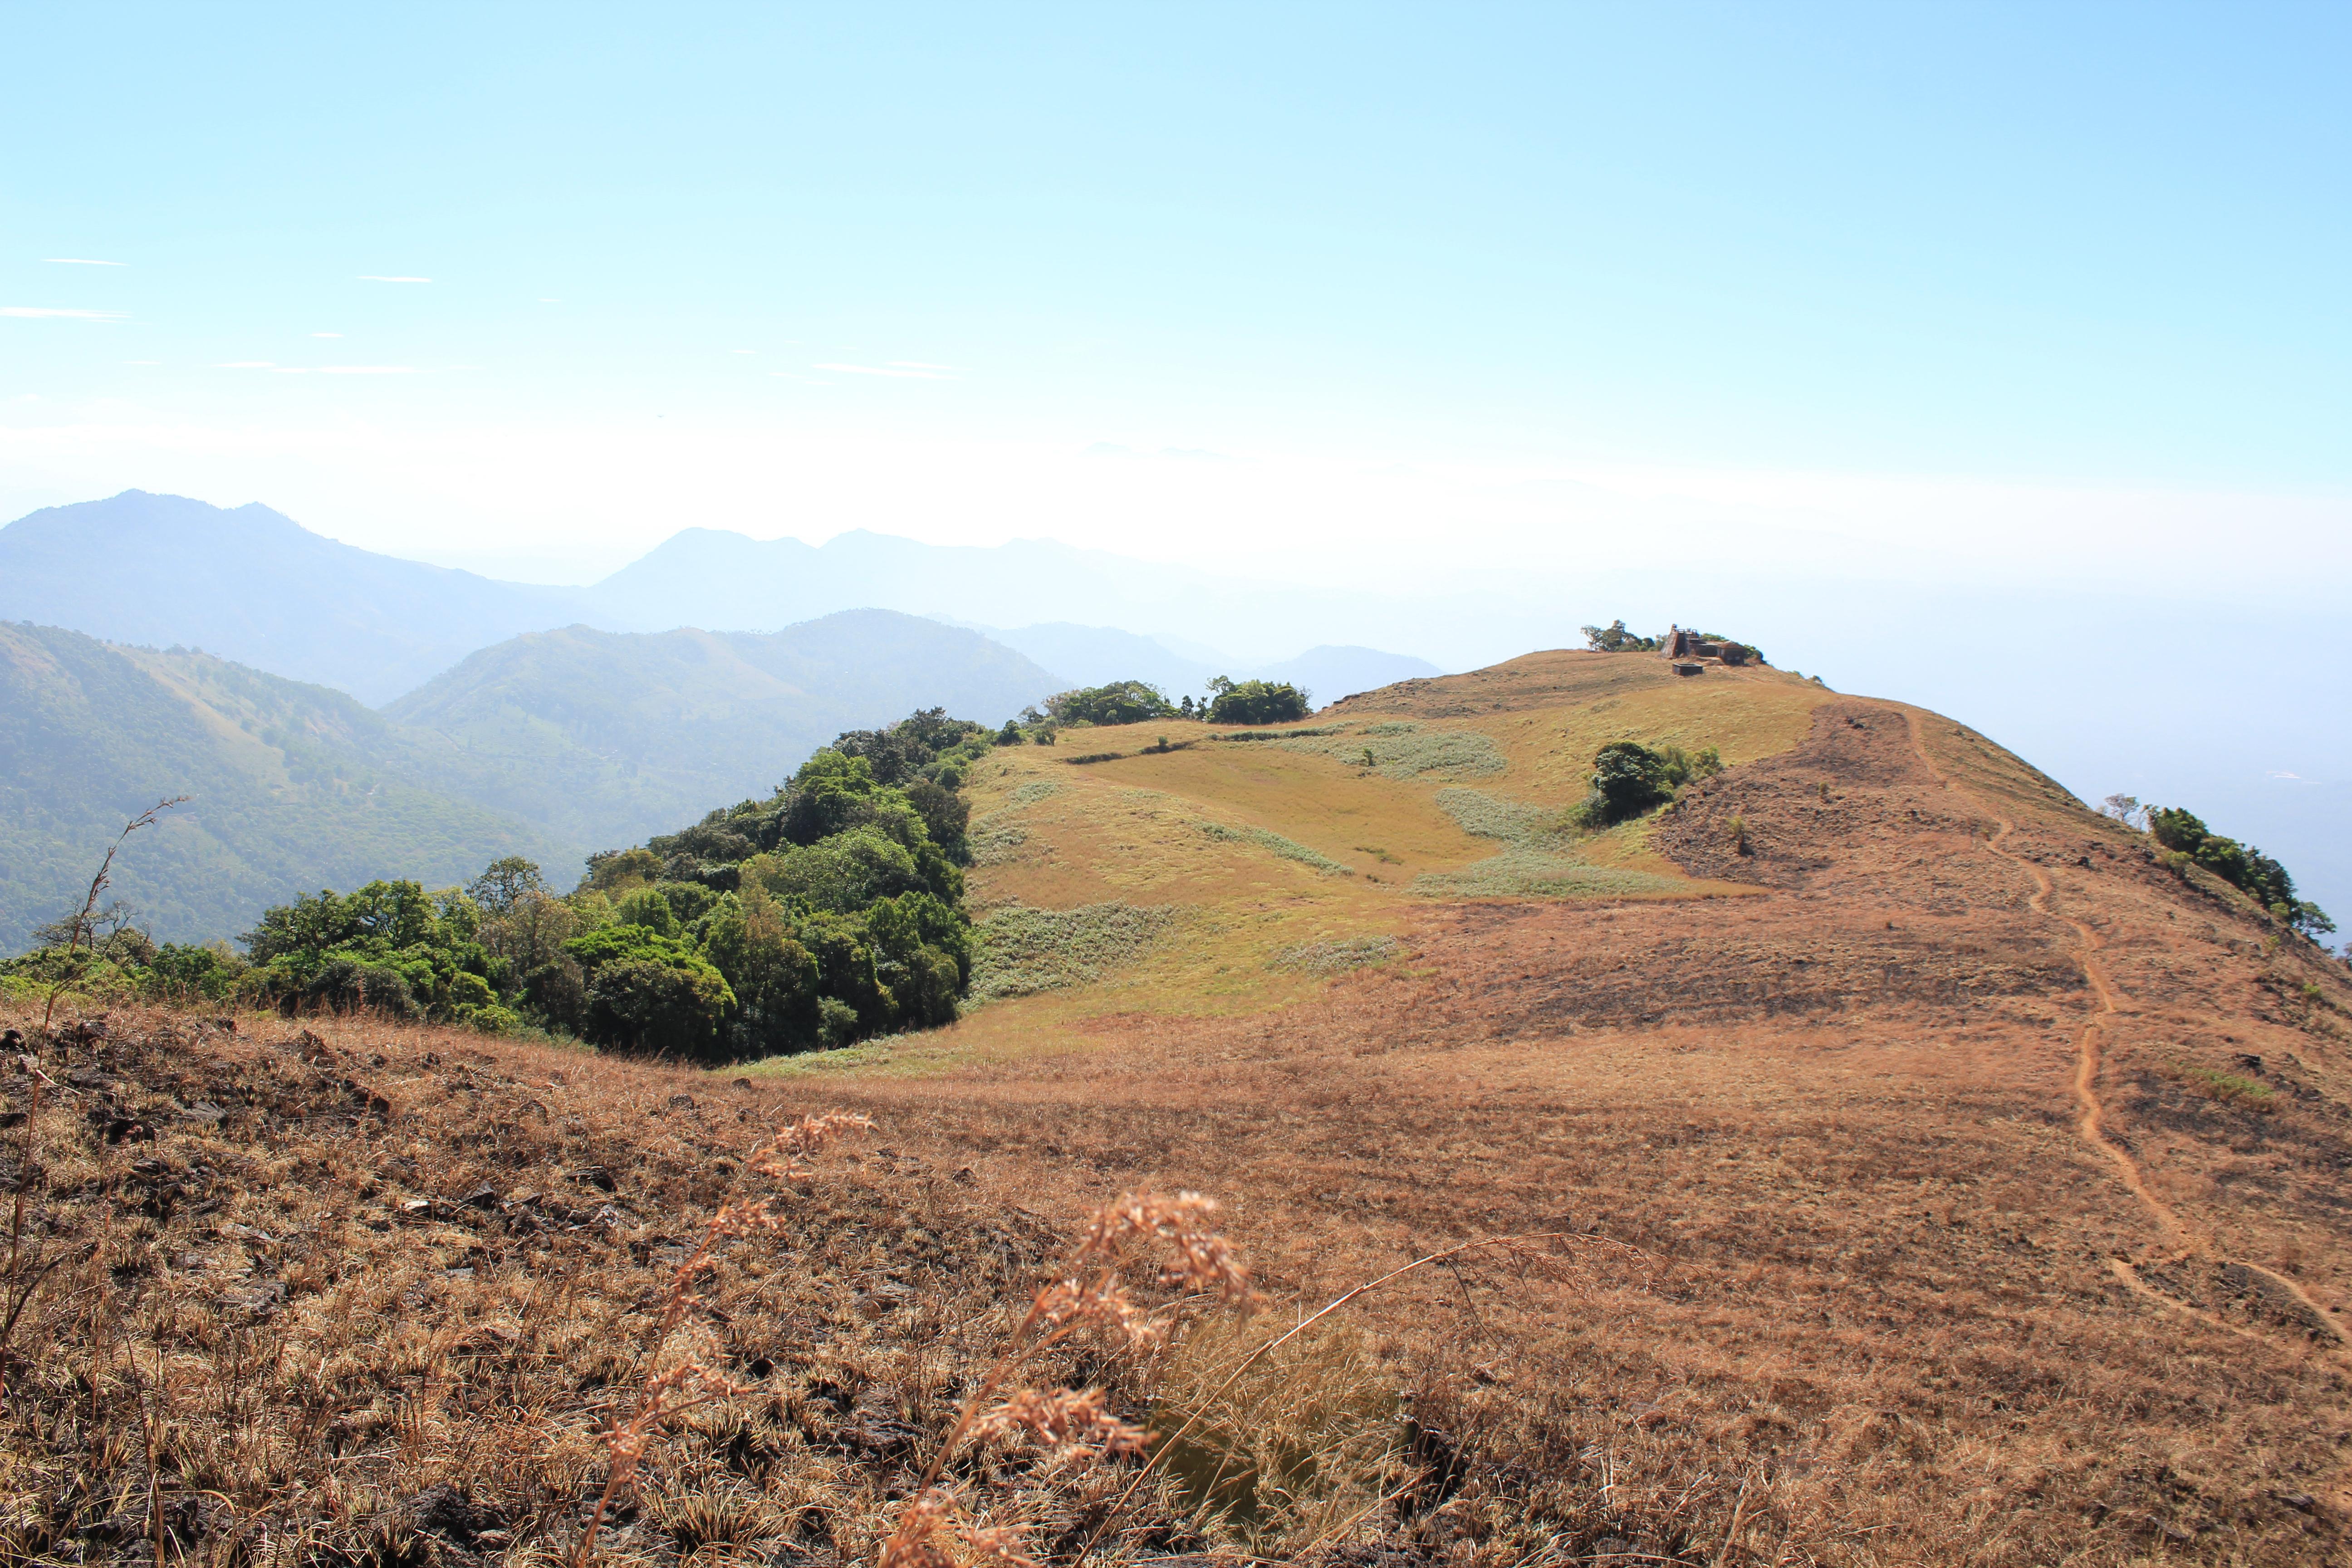 File:Paithalmala Hill top.JPG - Wikimedia Commons